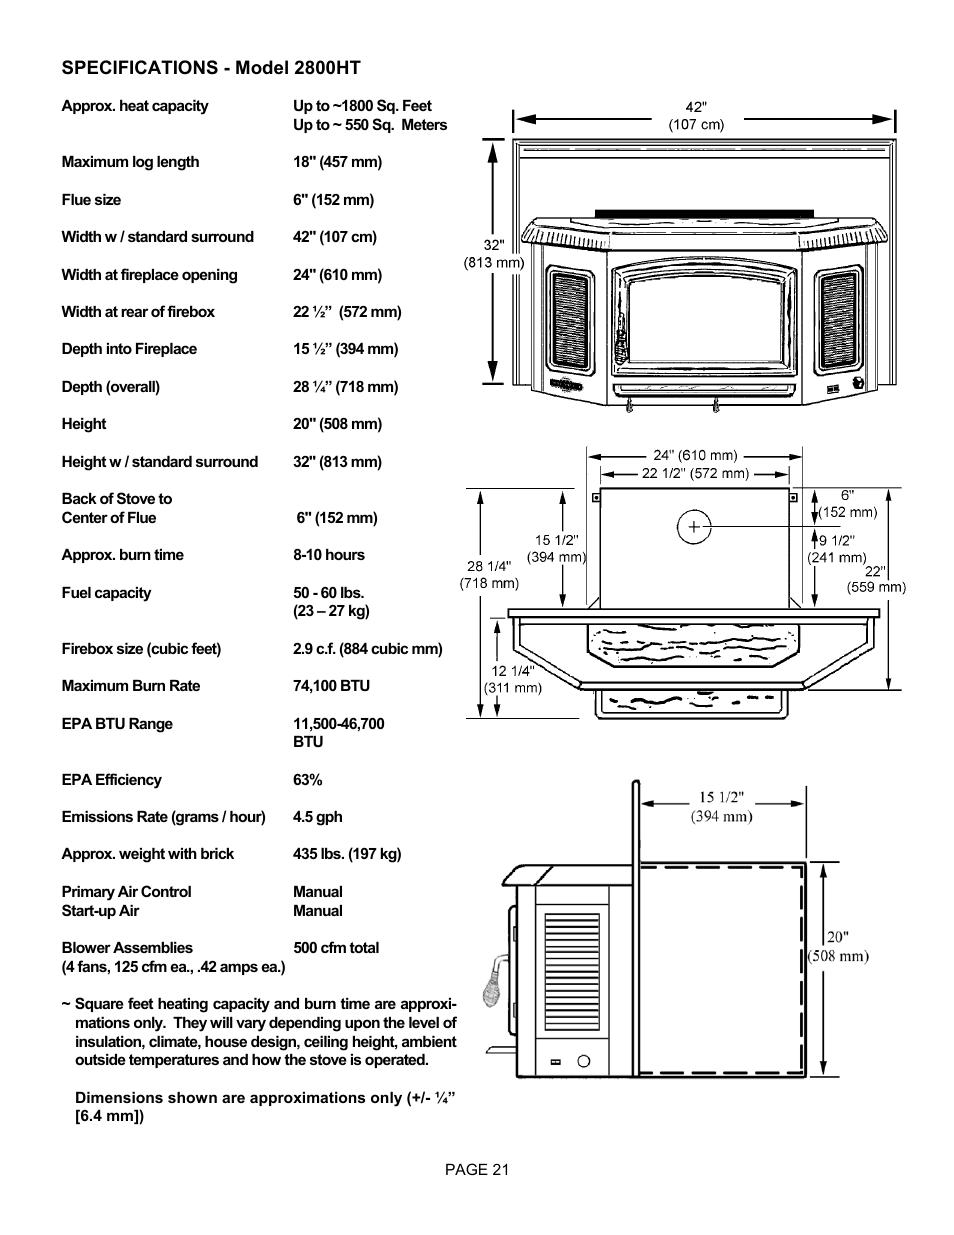 Lg Earth Stove 2800ht User Manual